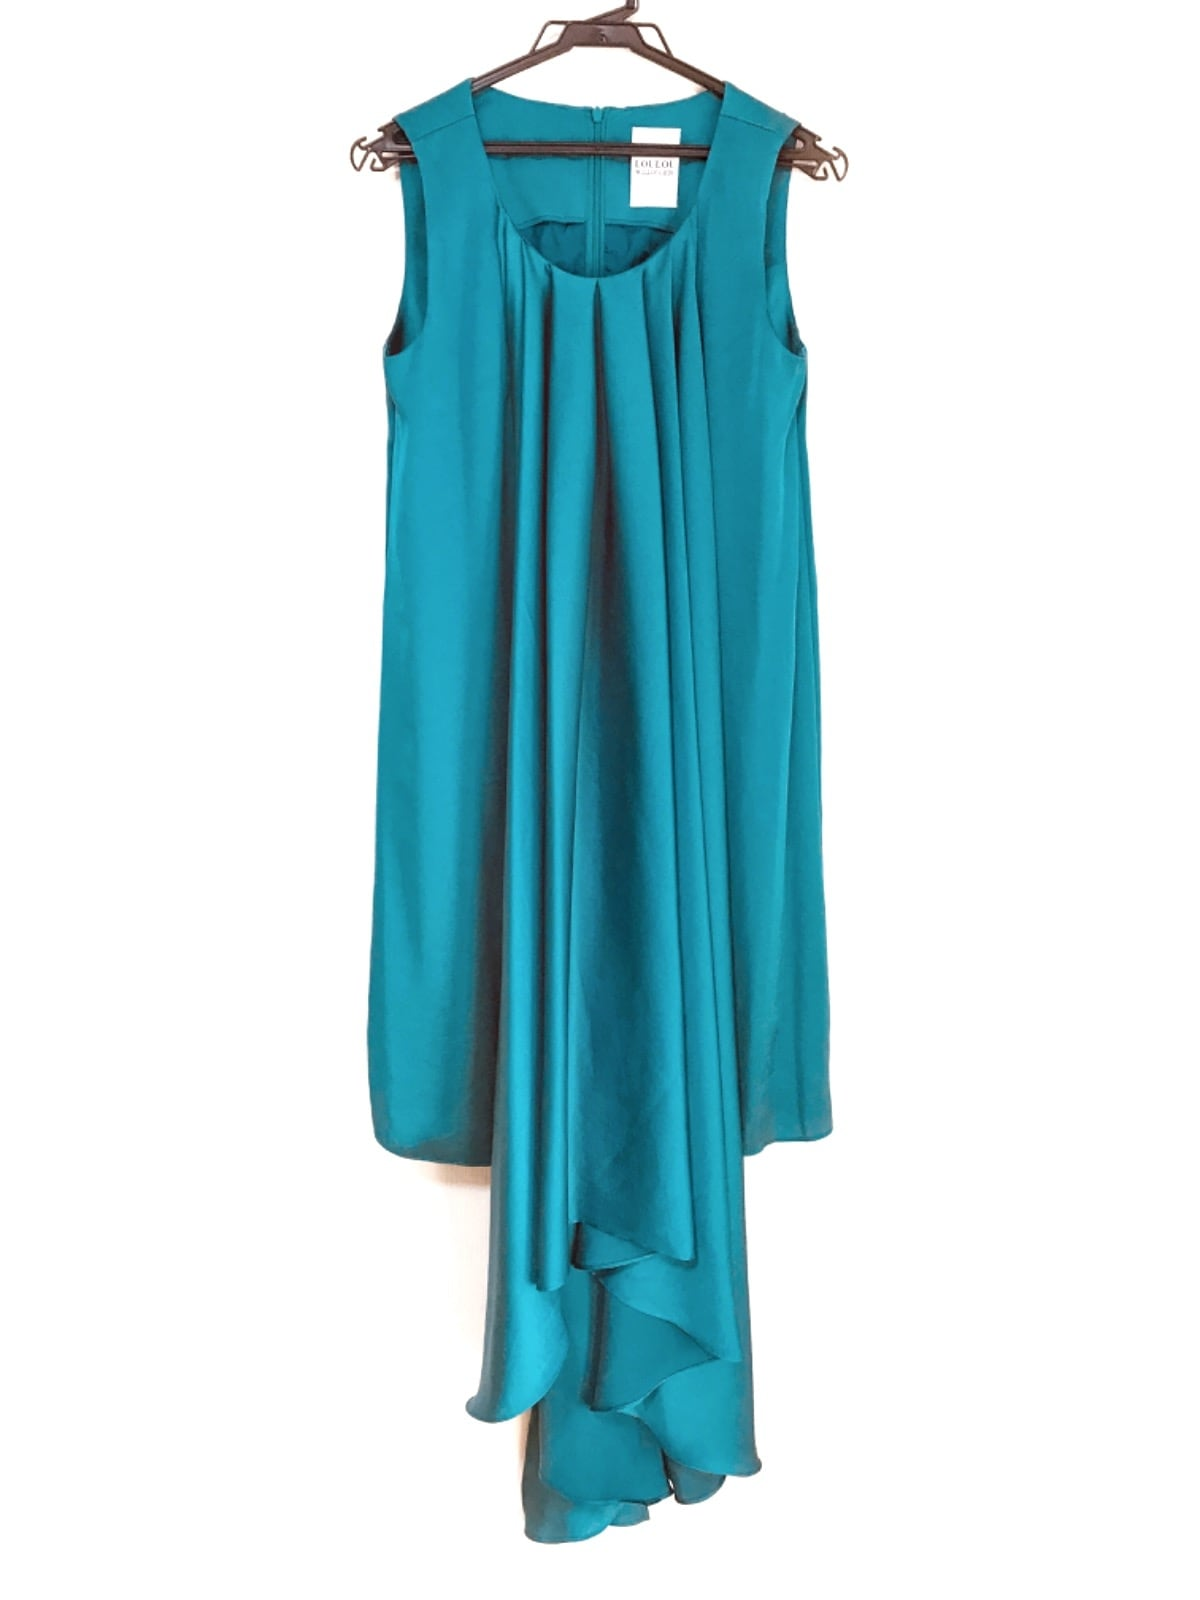 Loulou Willoughby(ルルウィルビー)のドレス